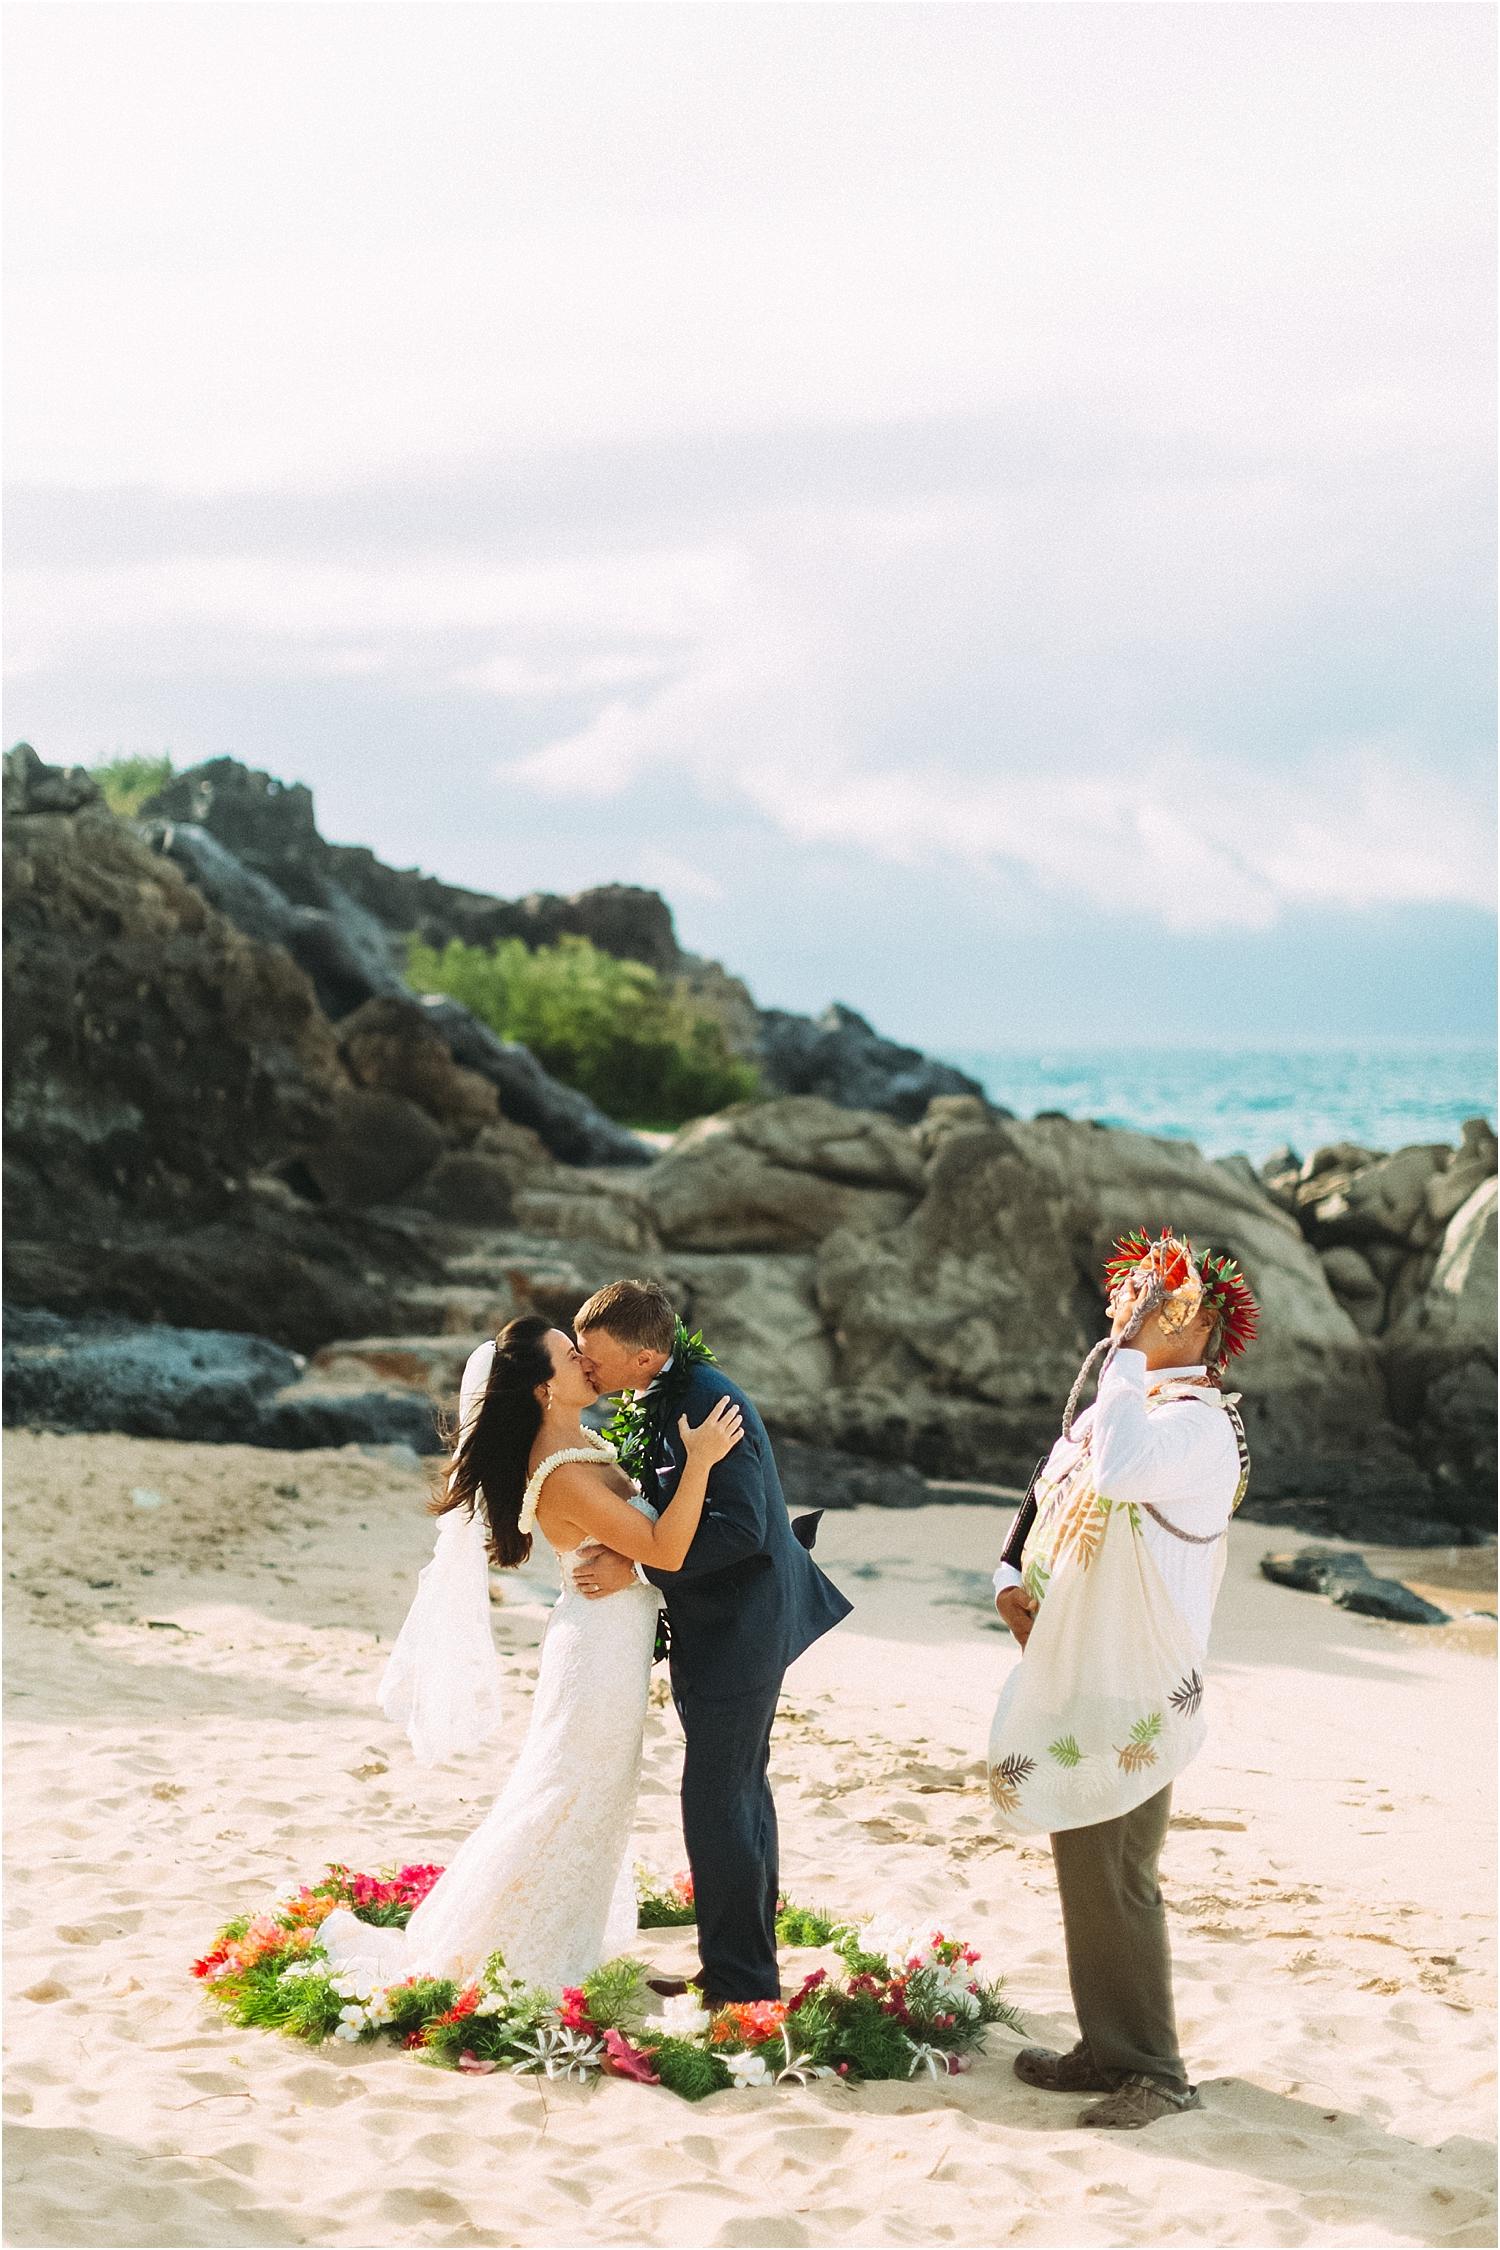 angie-diaz-photography-maui-wedding-ironwoods-beach_0028.jpg